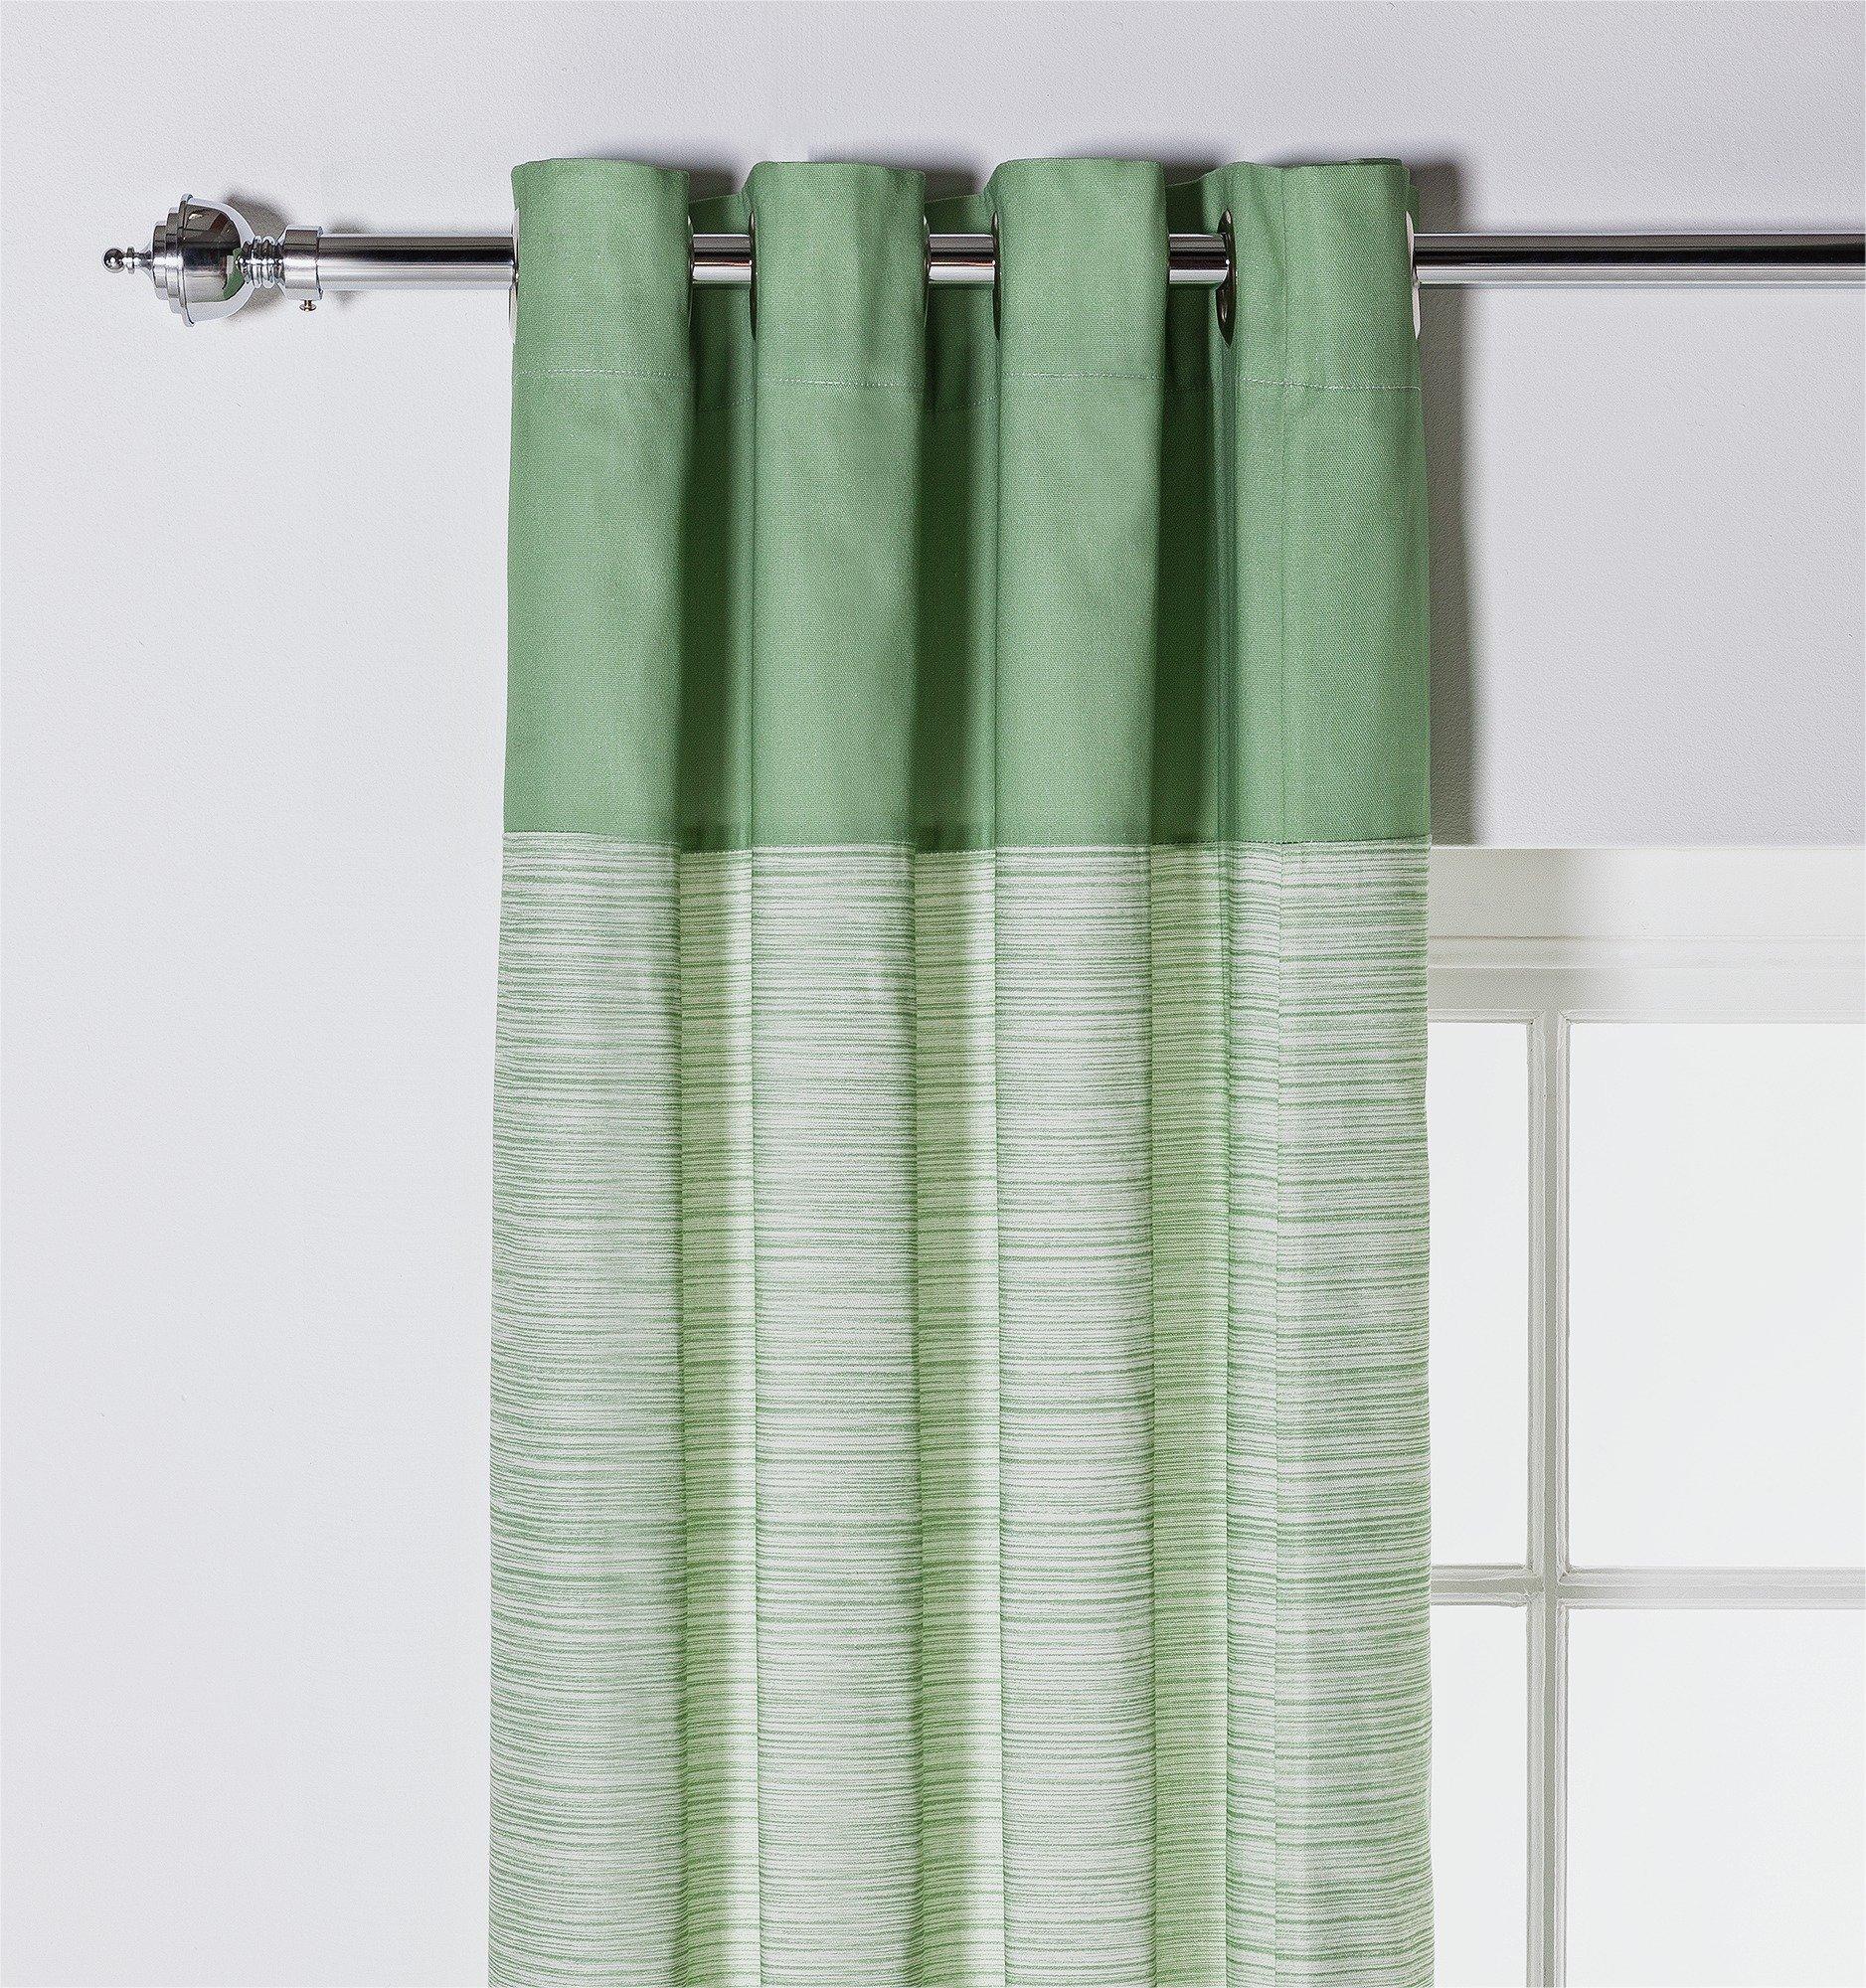 argos curtains sale uk. Black Bedroom Furniture Sets. Home Design Ideas